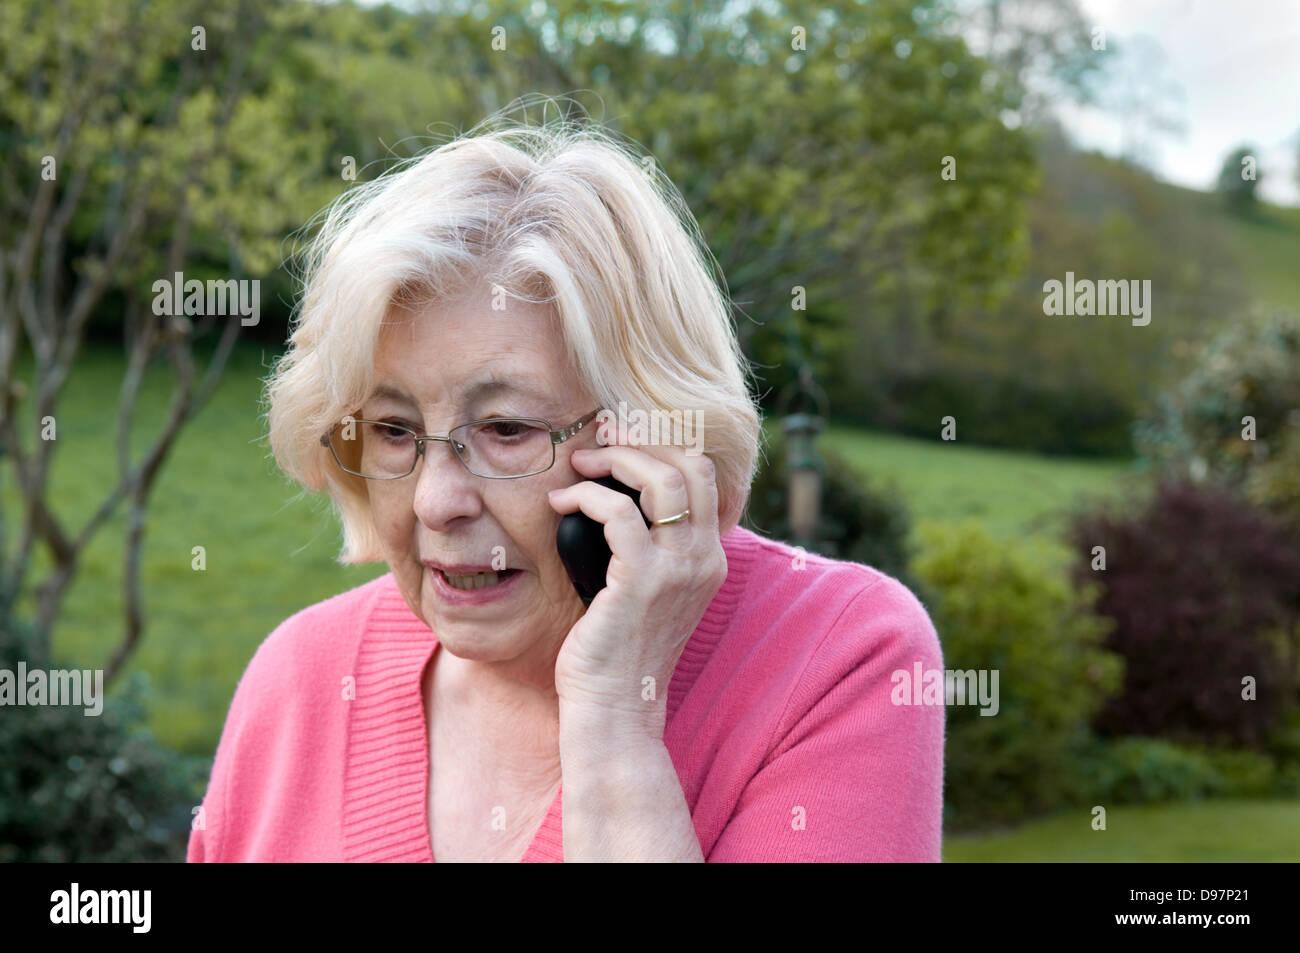 Senior lady using mobile phone in garden - Stock Image